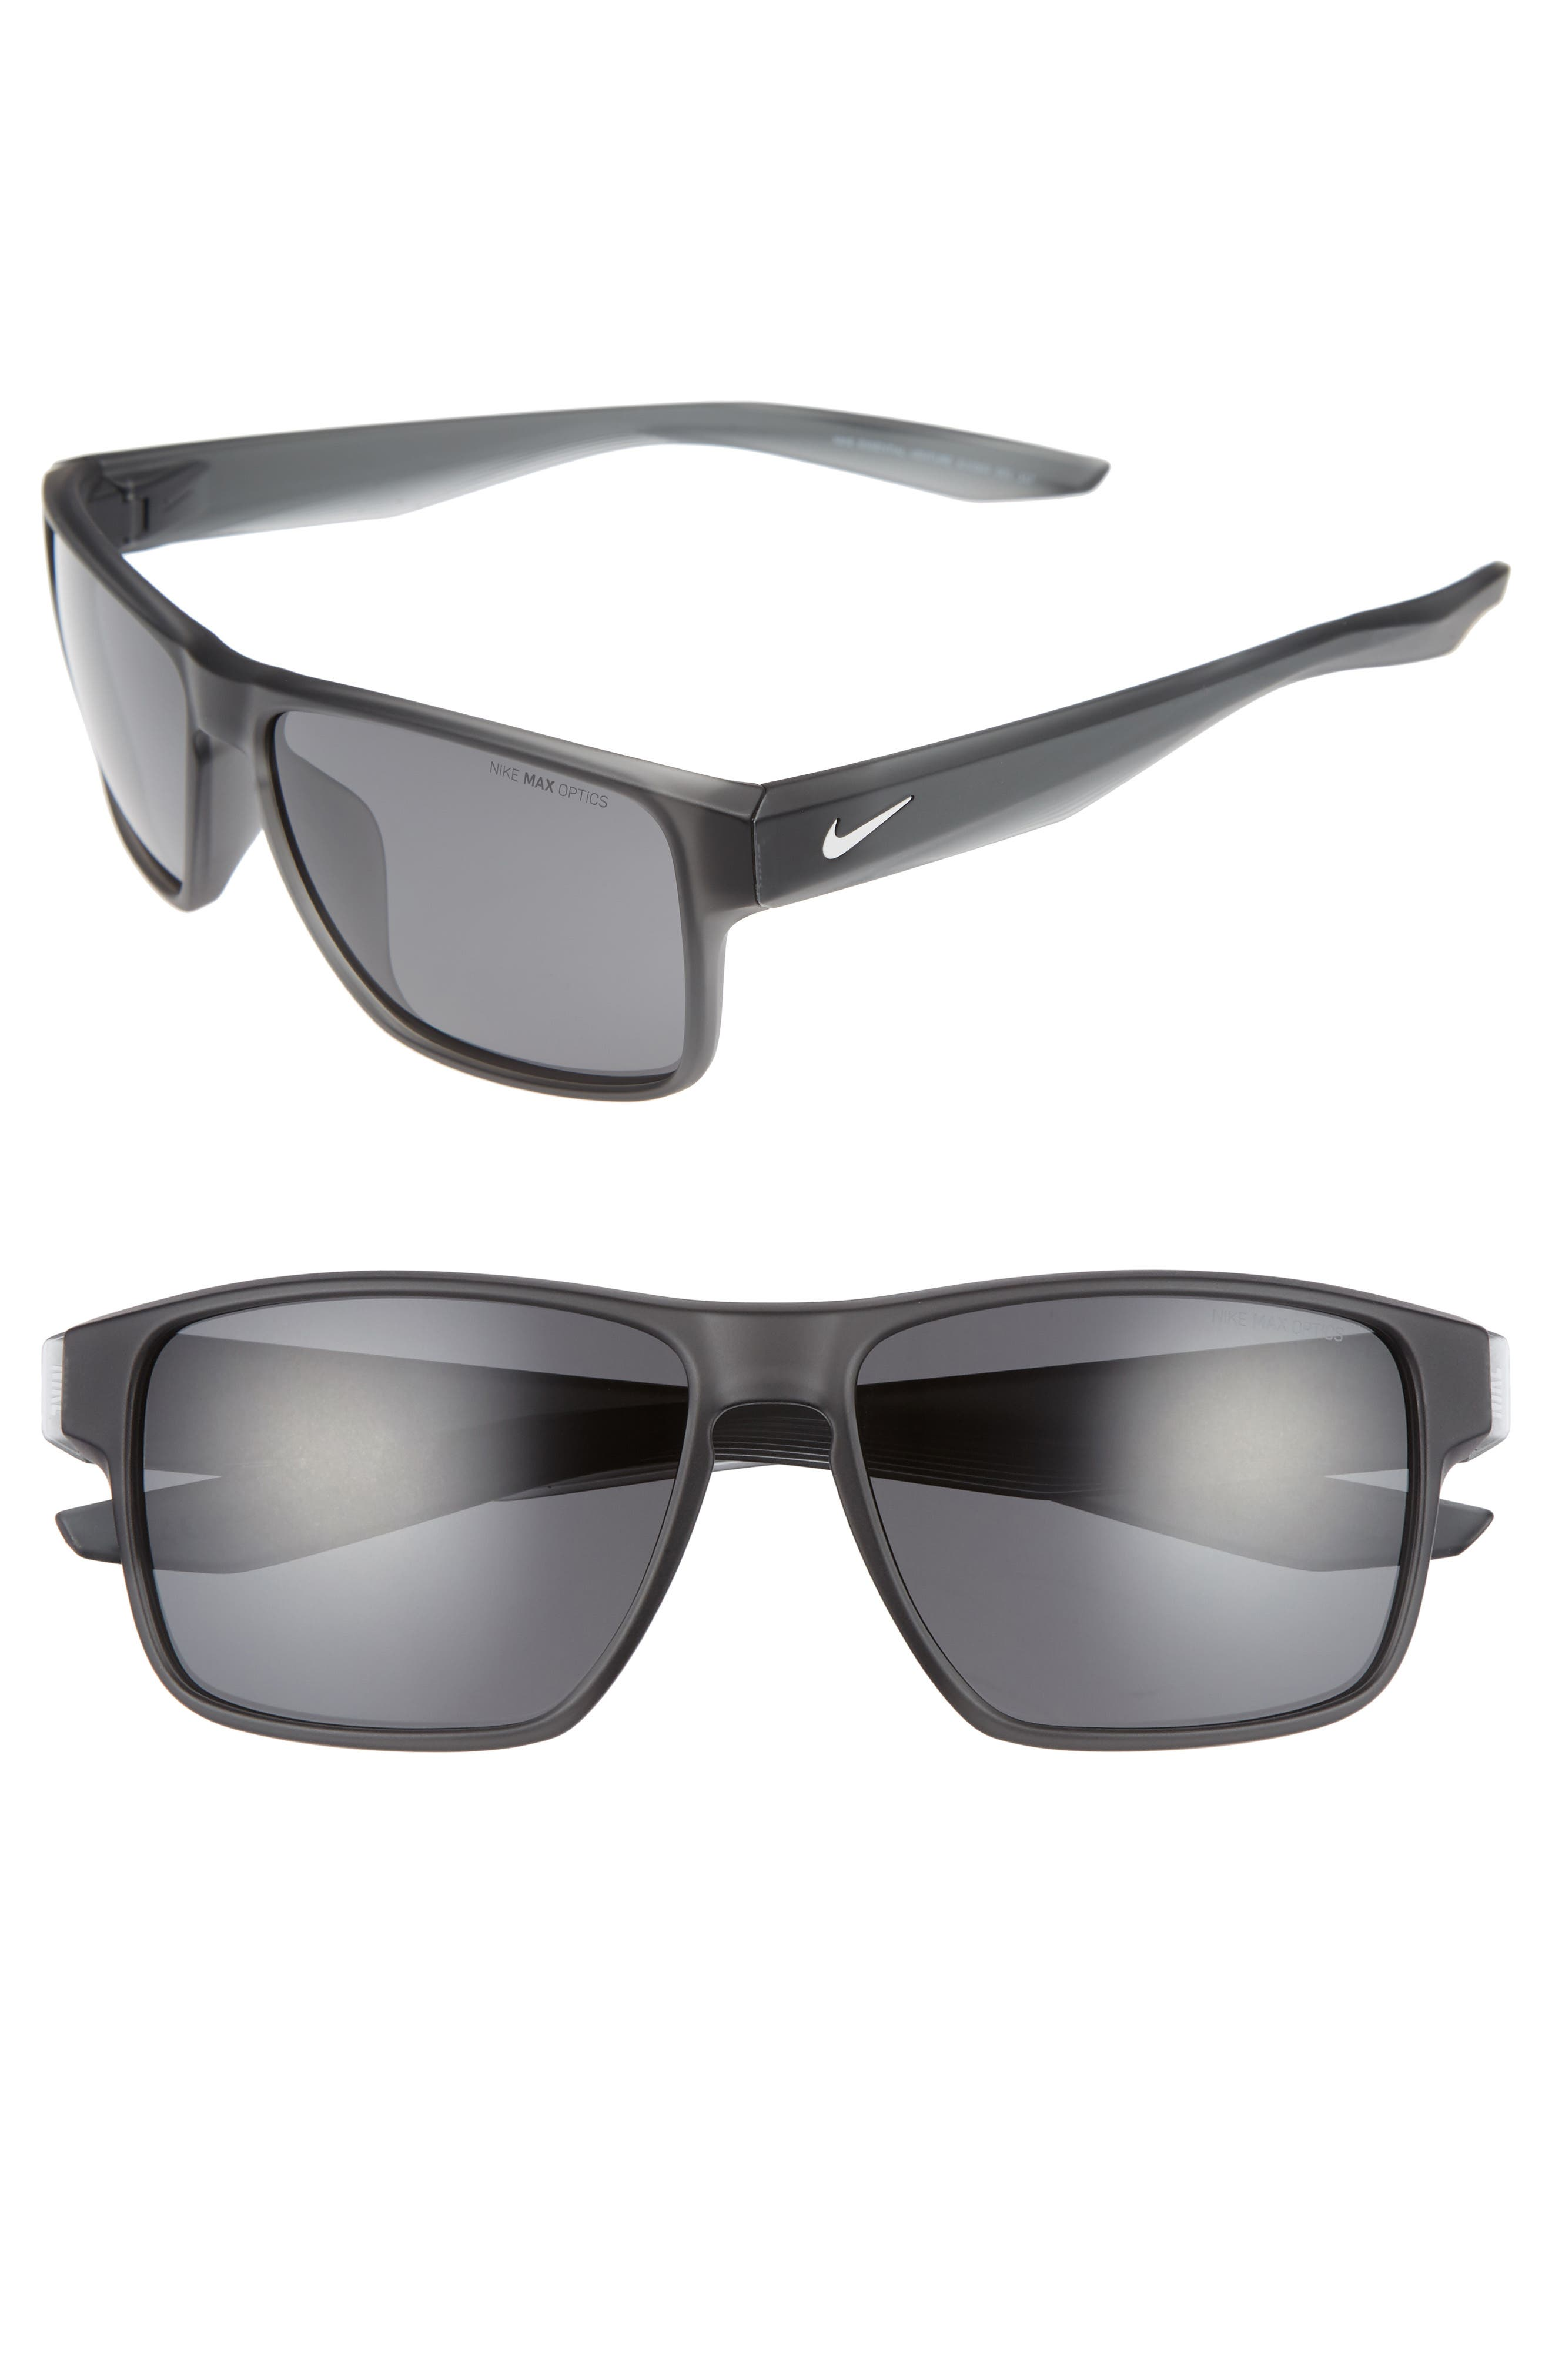 Essential Venture 59mm Sunglasses,                         Main,                         color, MATTE ANTHRACITE